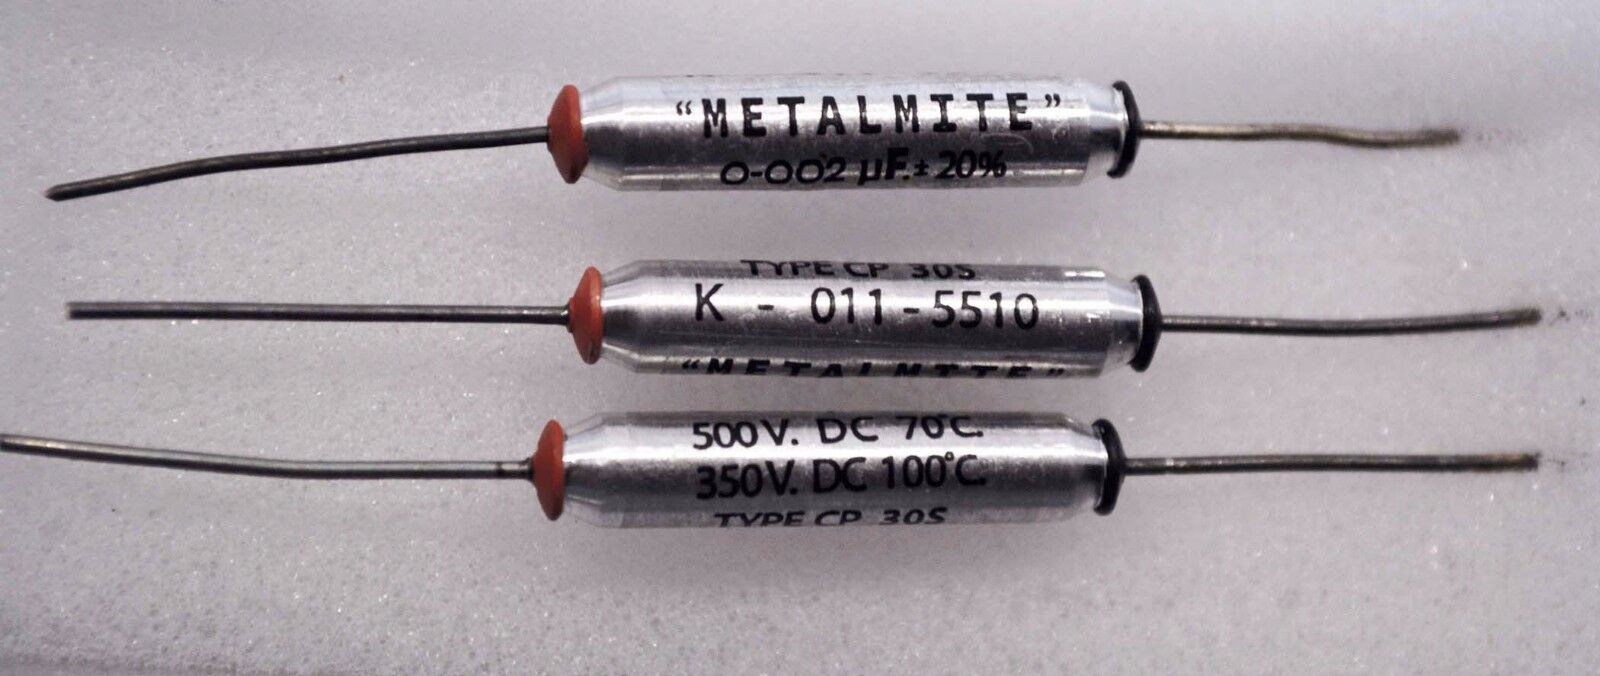 "E11 ""metalmite"" reproduction capacitors stormtrooper blaster cylinders"